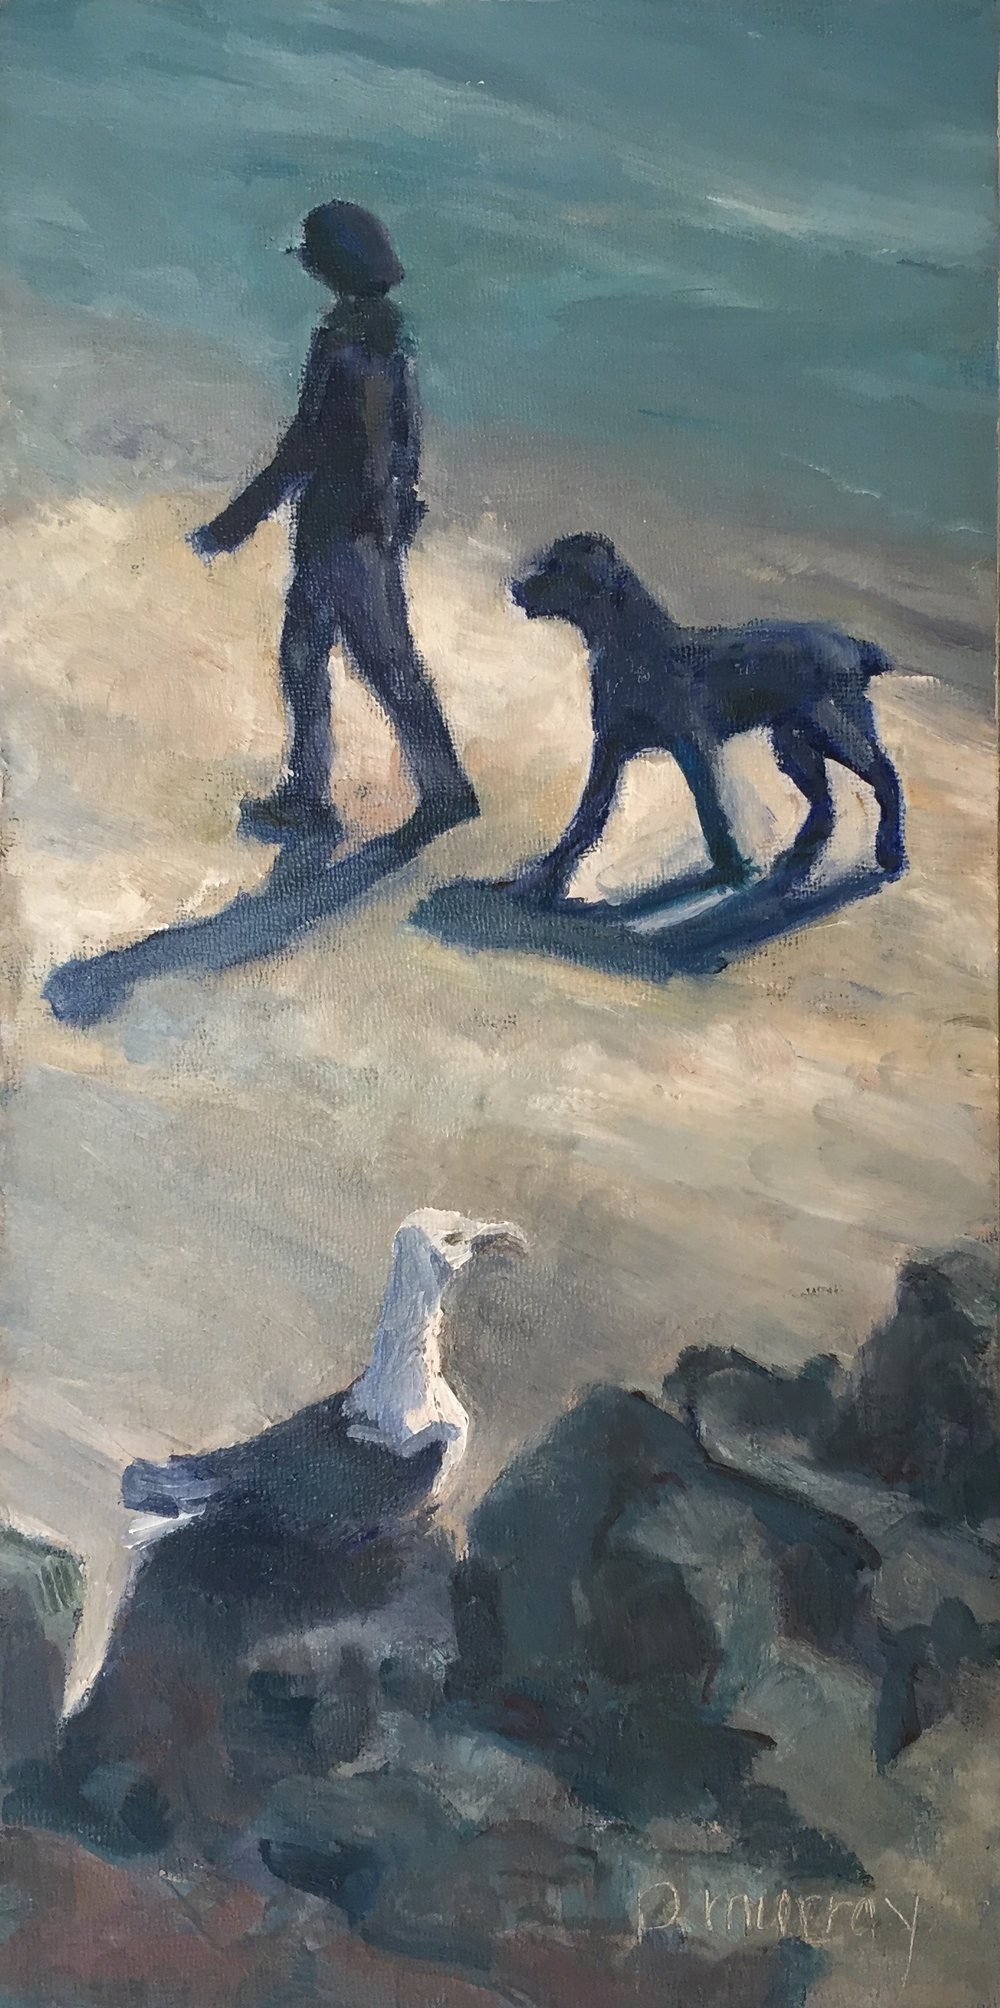 Beach Strollers with Onlooker